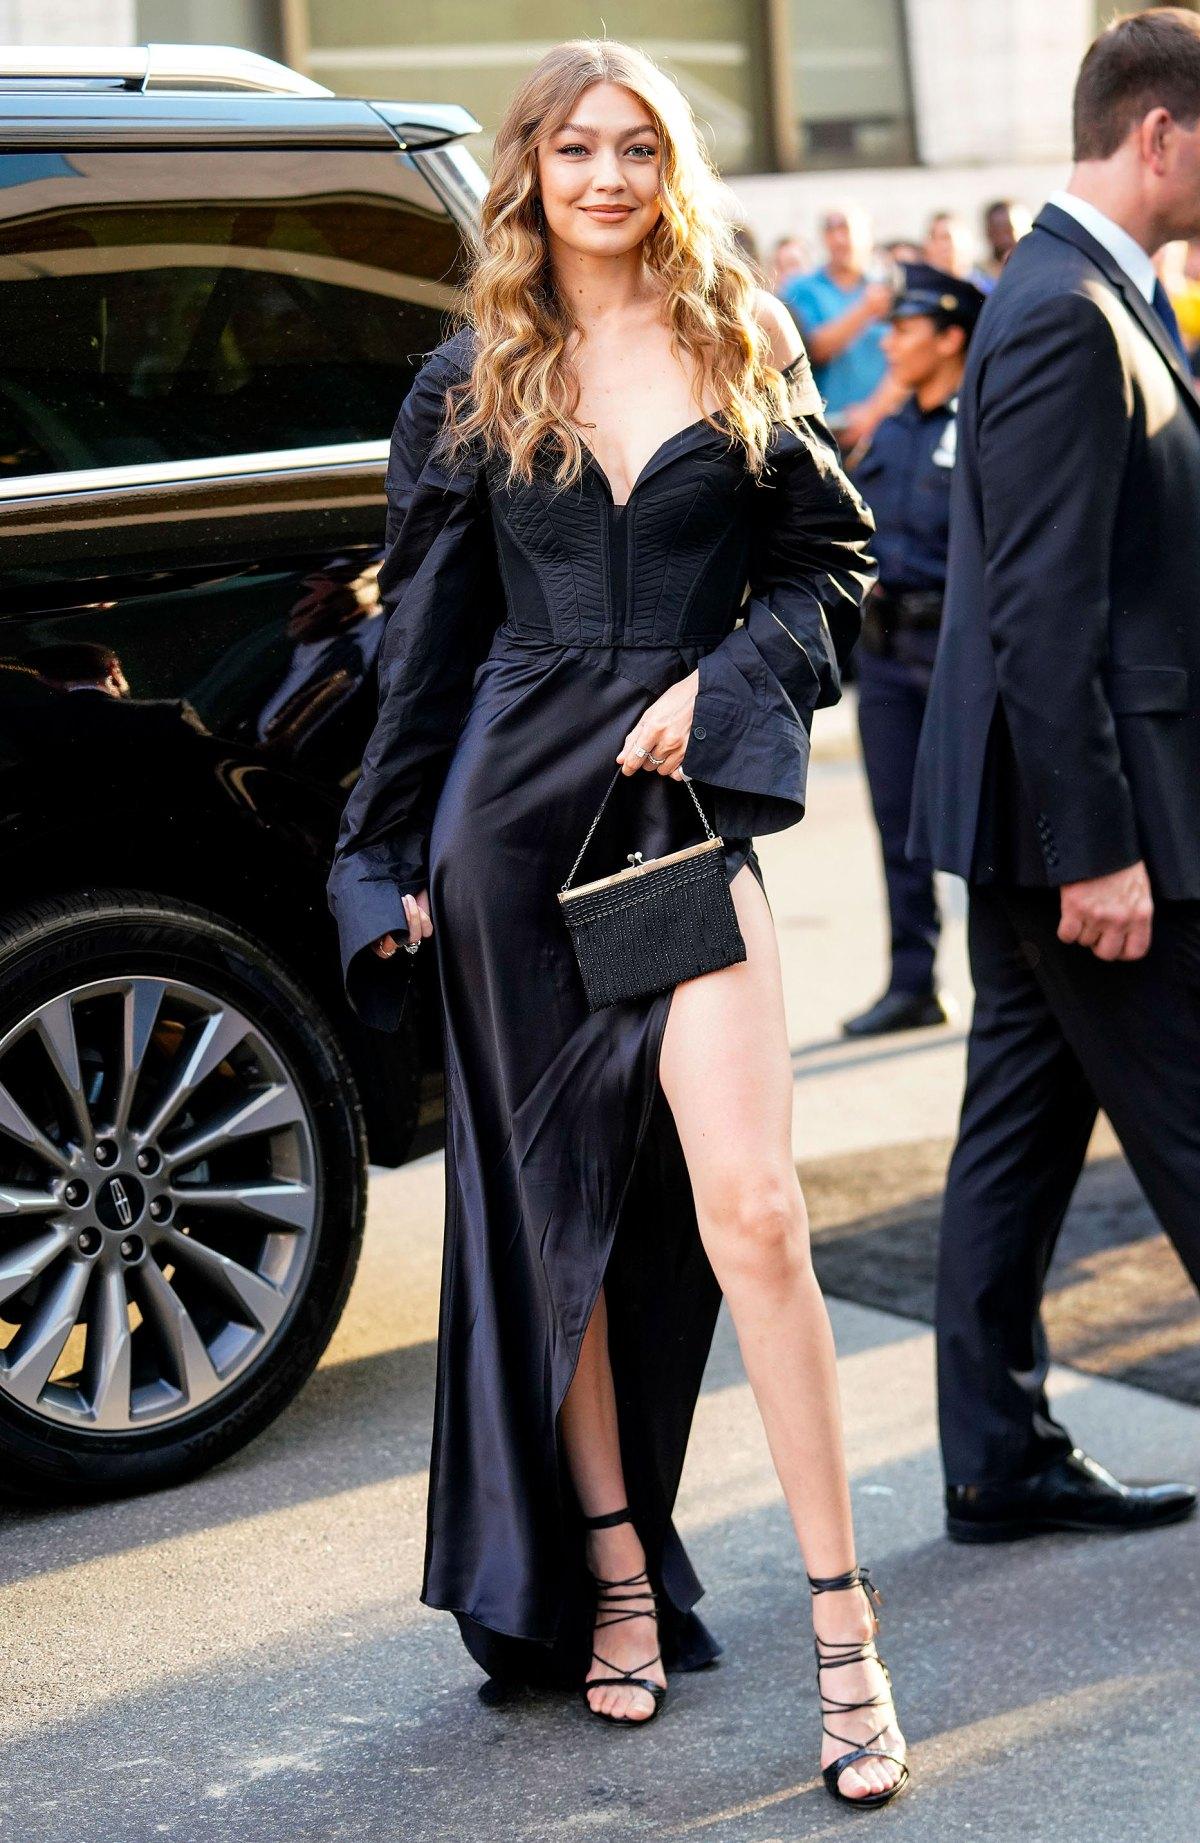 c206f322e78b Gigi Hadid s Best 2018 Street Style Fashion  Pics